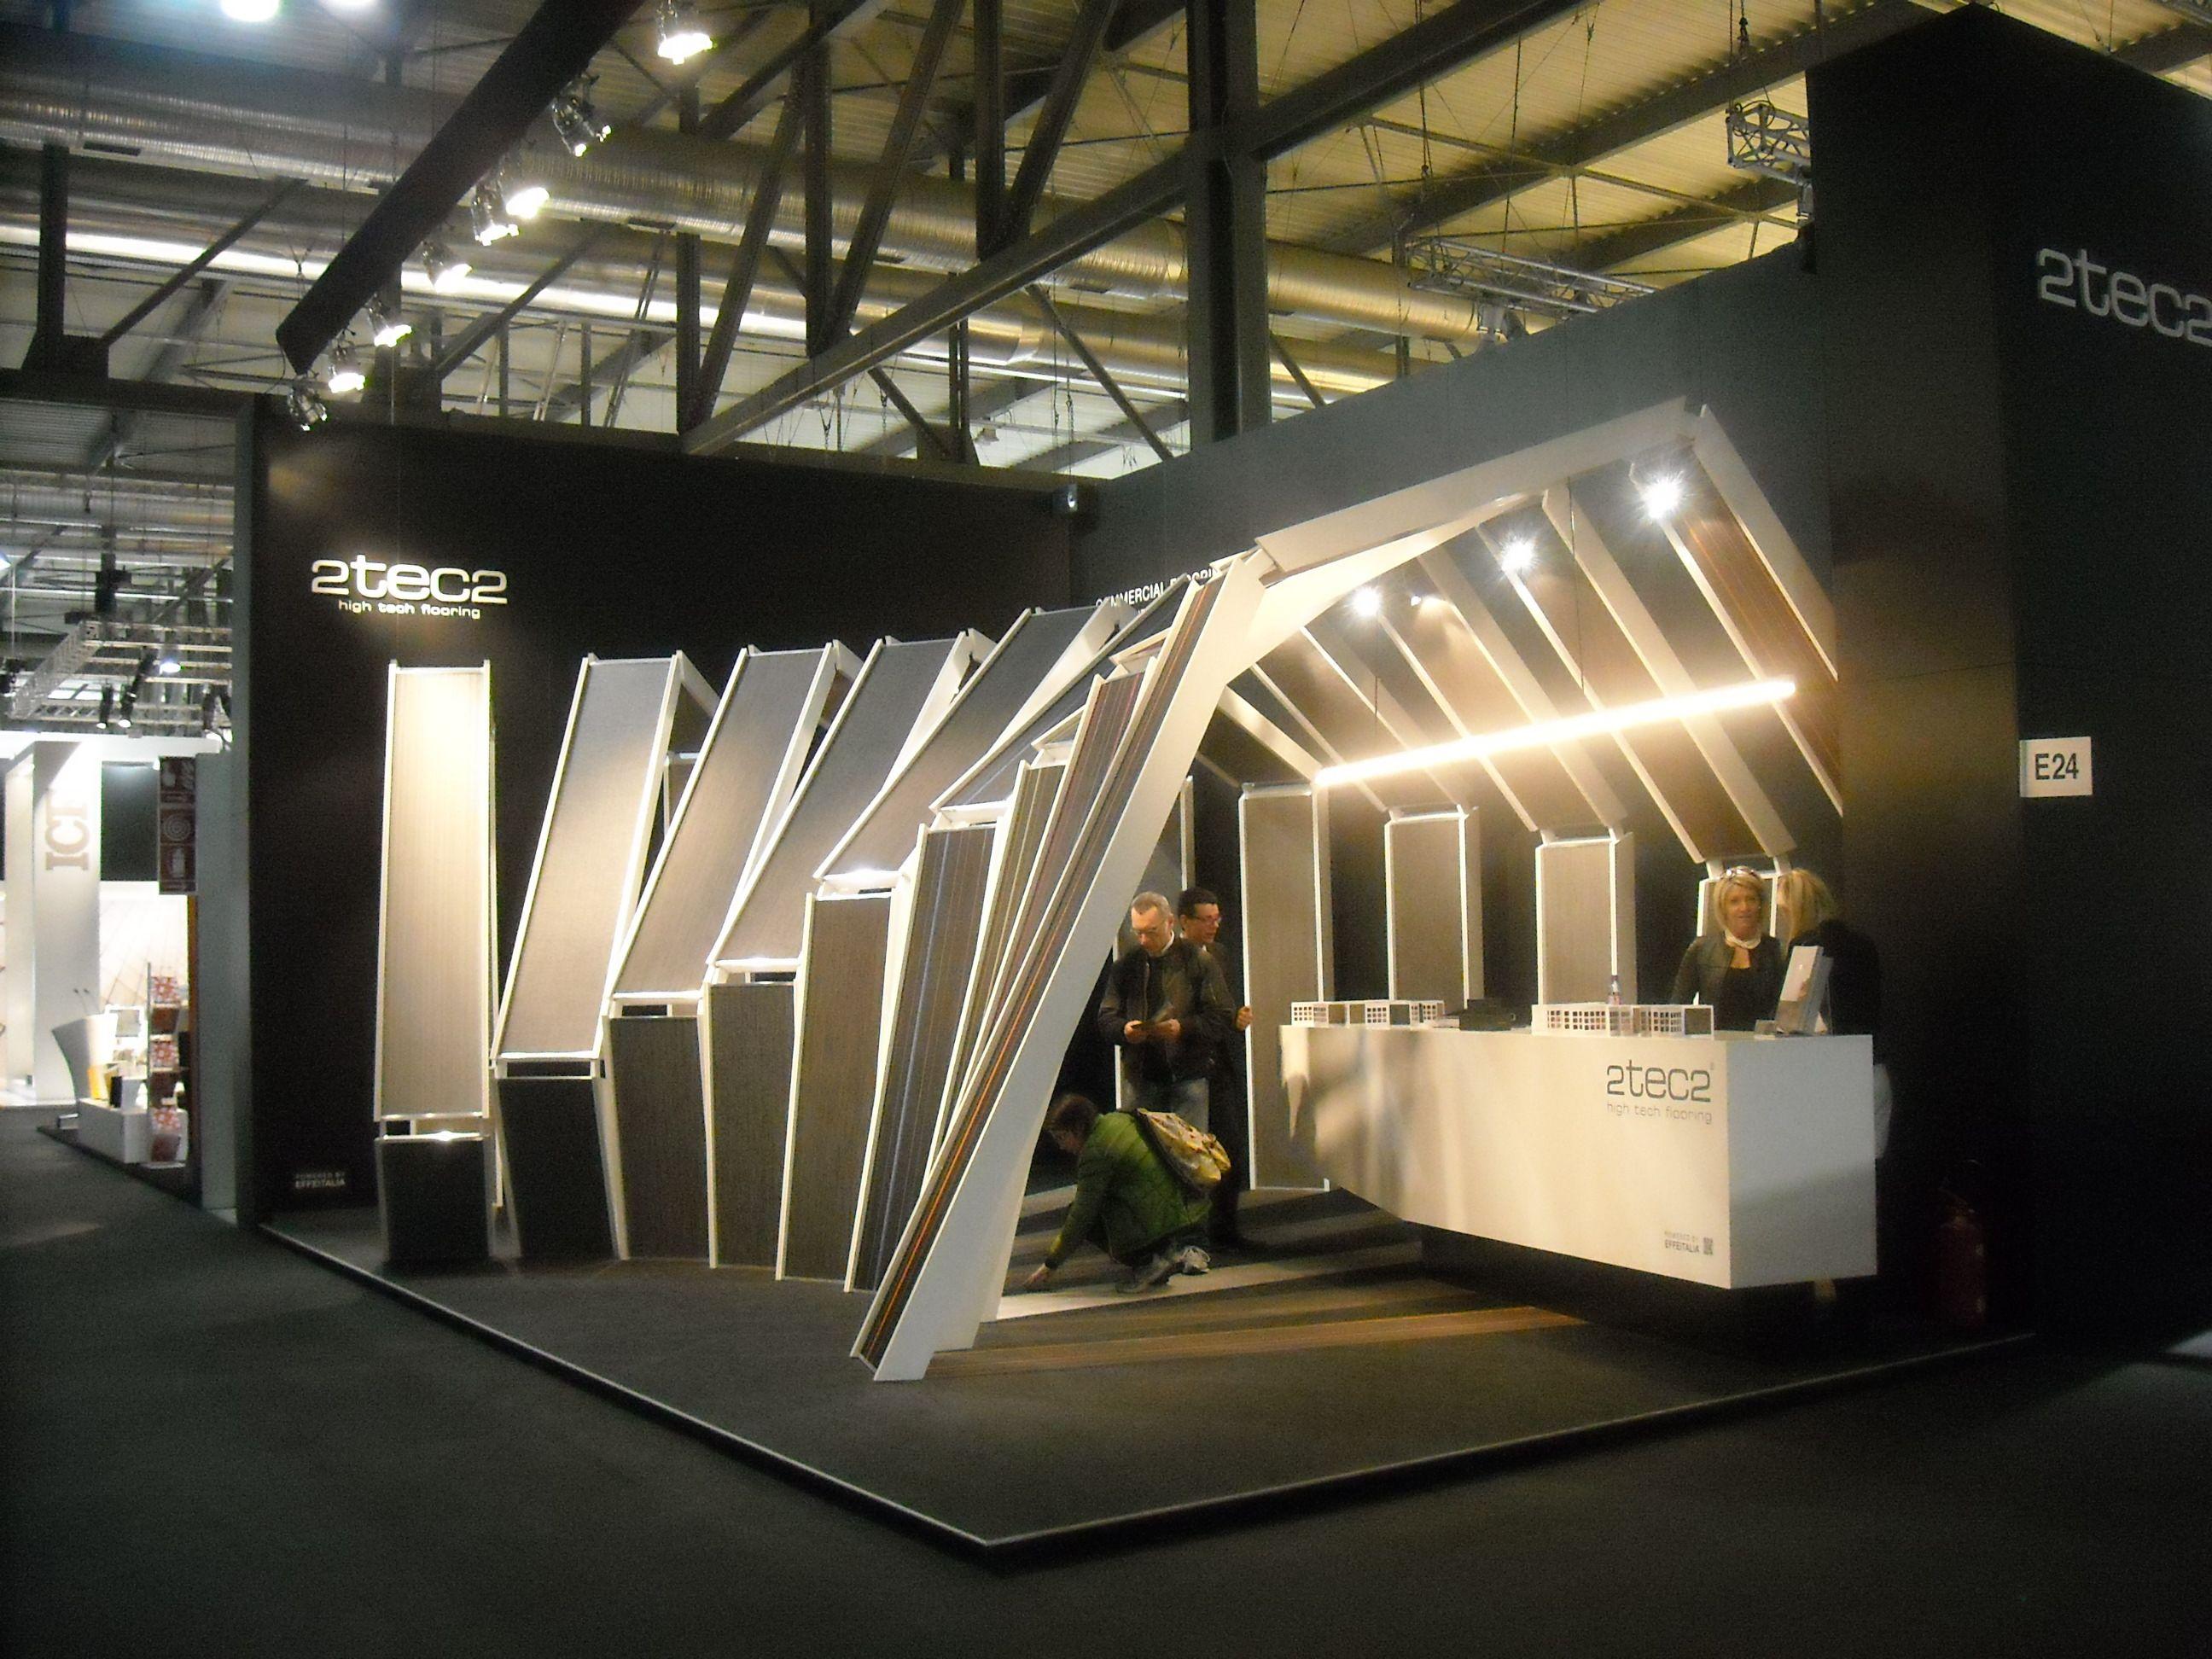 salon du meuble milan 2013 exhibition stand pinterest. Black Bedroom Furniture Sets. Home Design Ideas